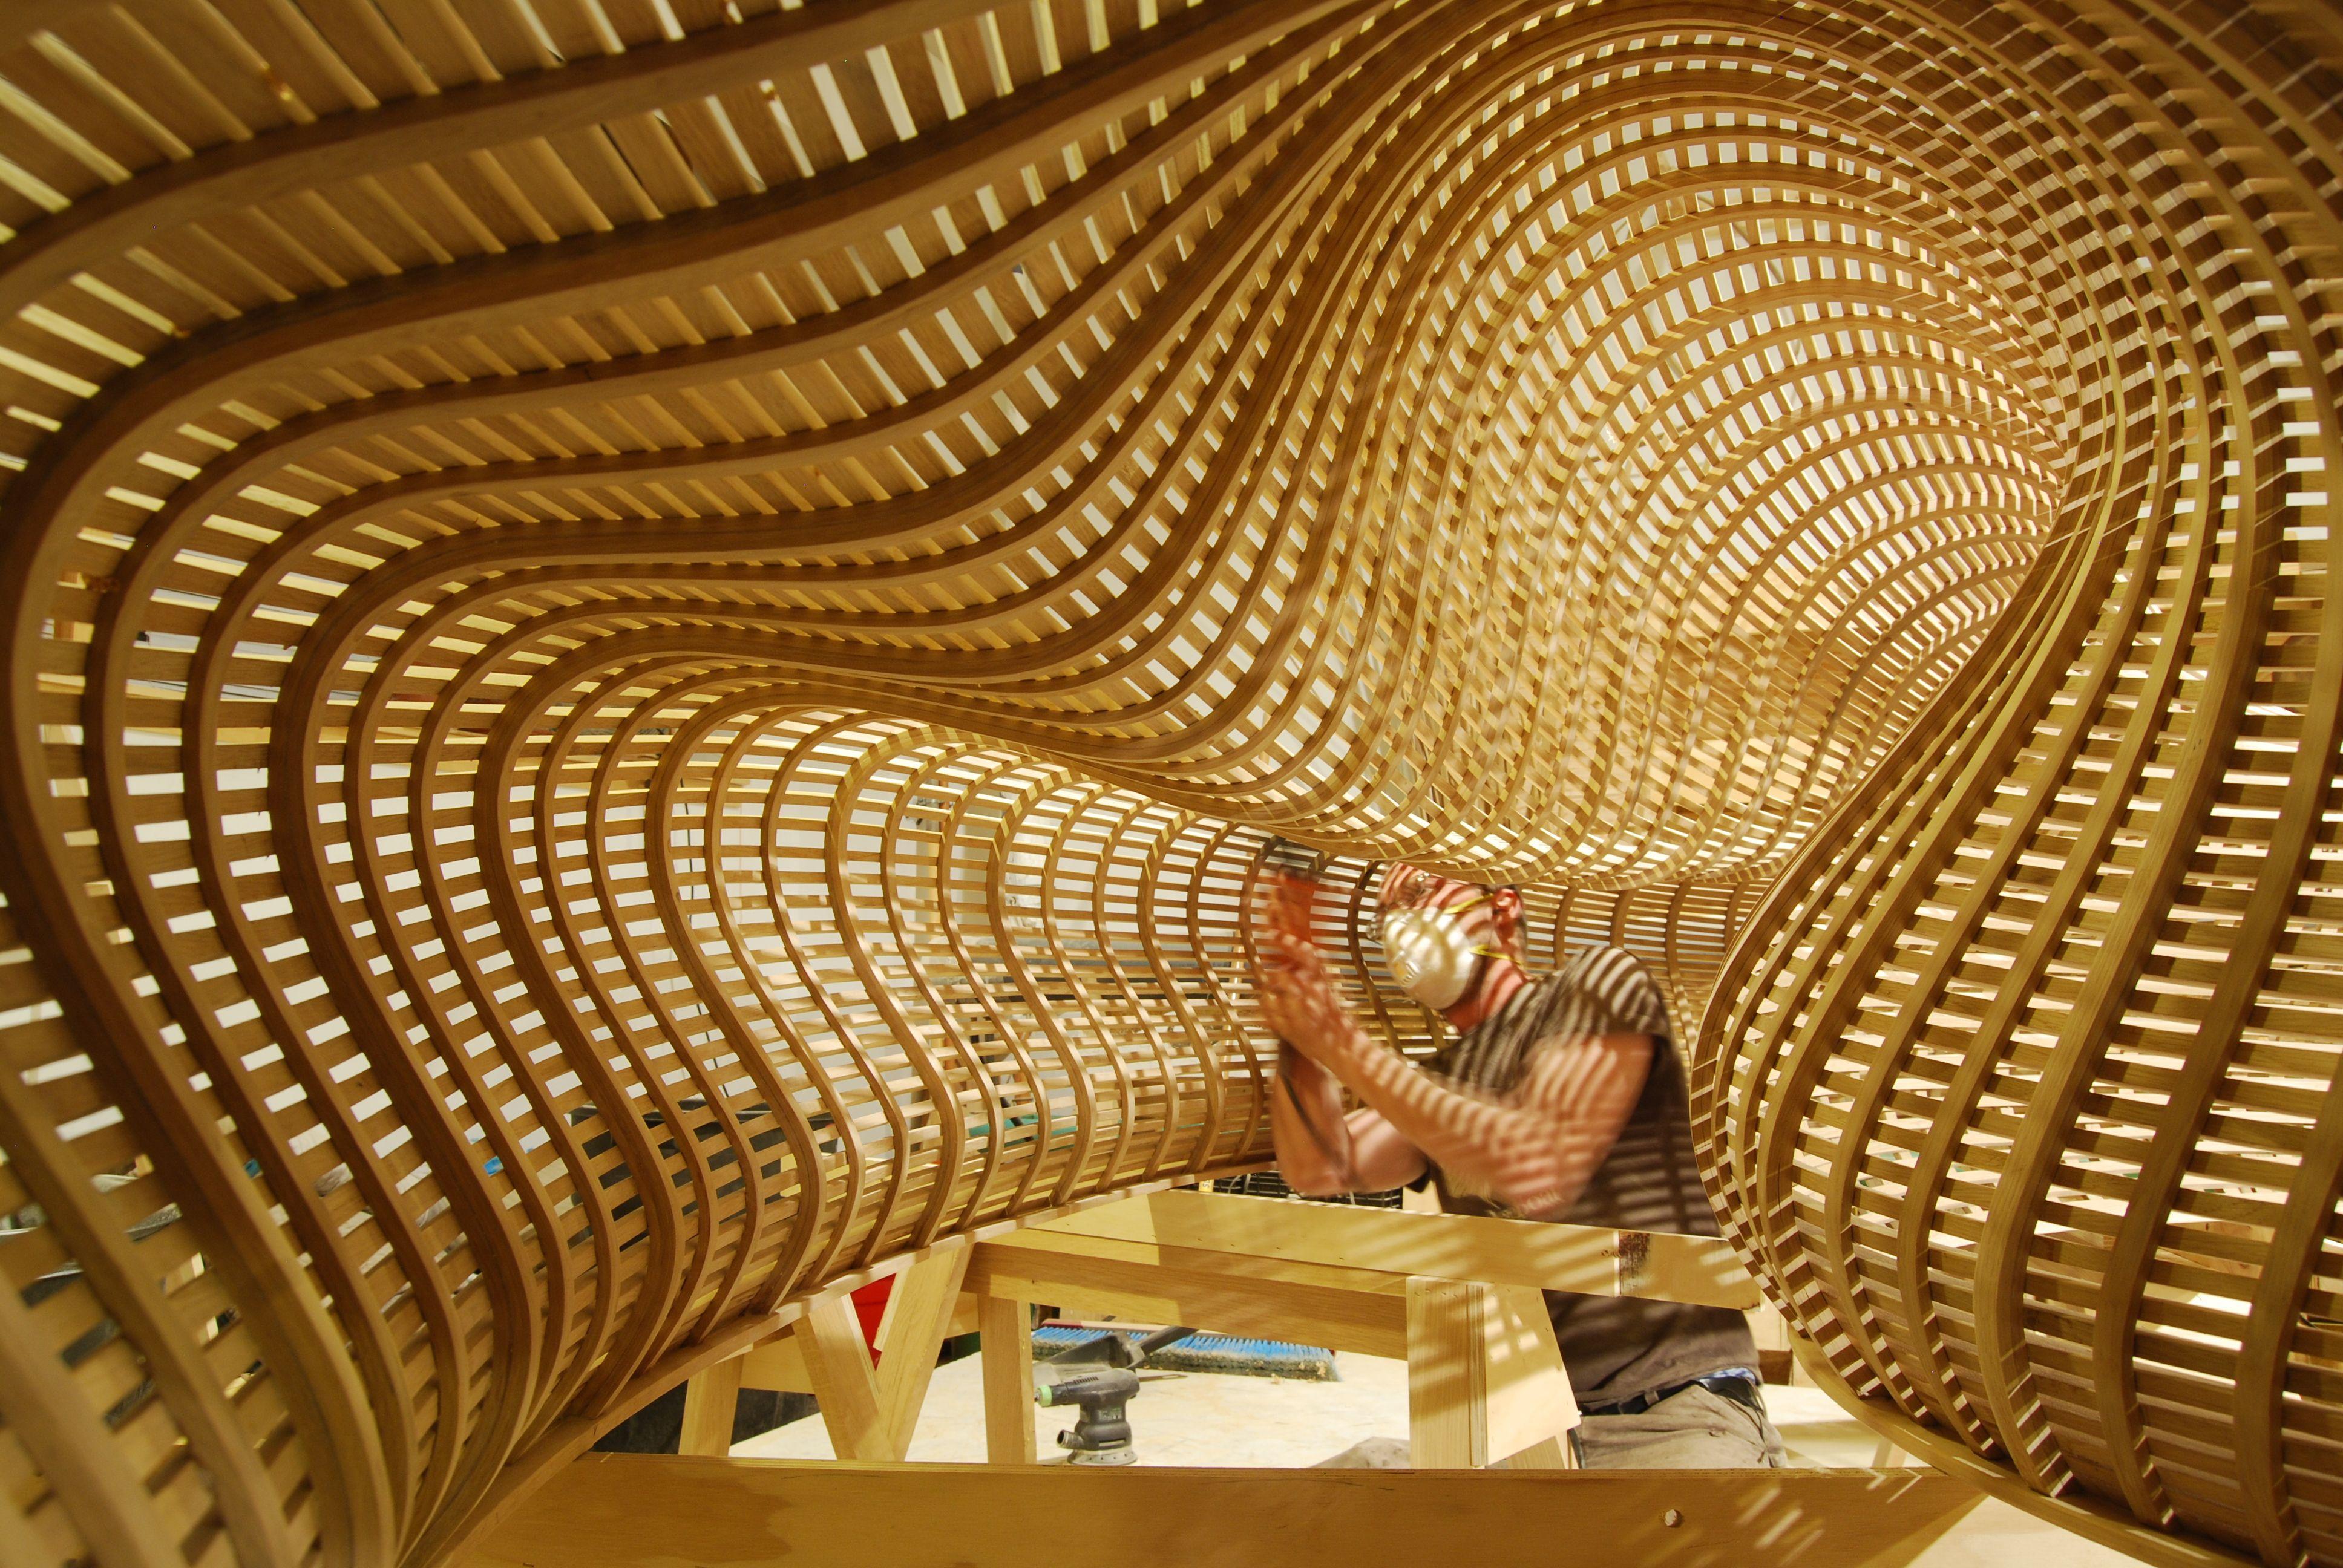 Matthias Pliessnig matthias pliessnig   the makers collaboration   pinterest   wood